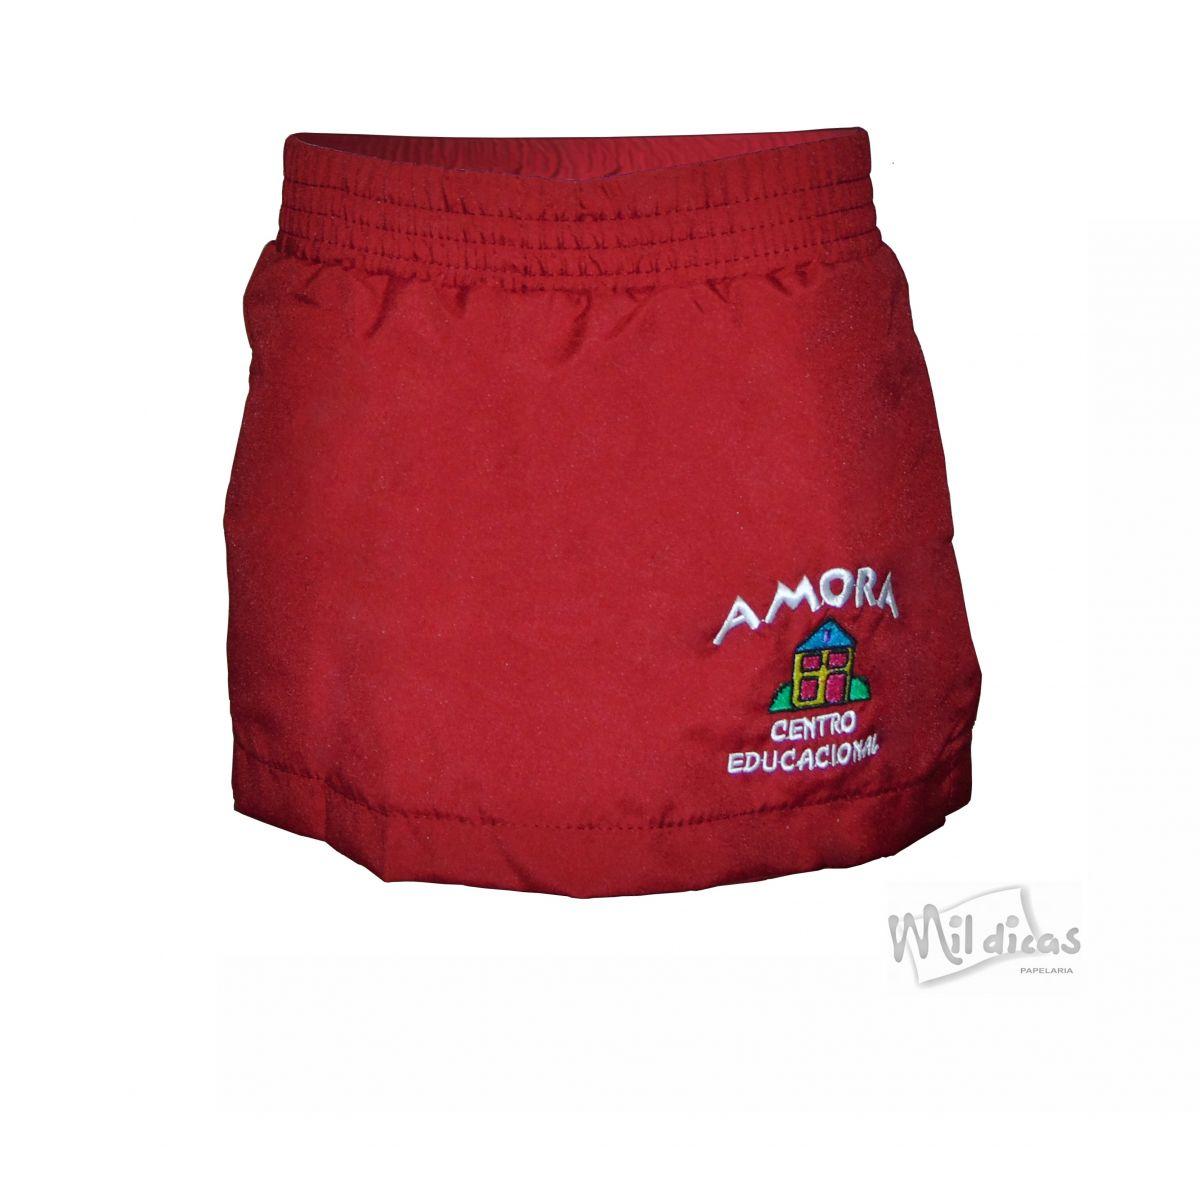 SHORT SAIA TACTEL FEMININO CRECHE AMORA